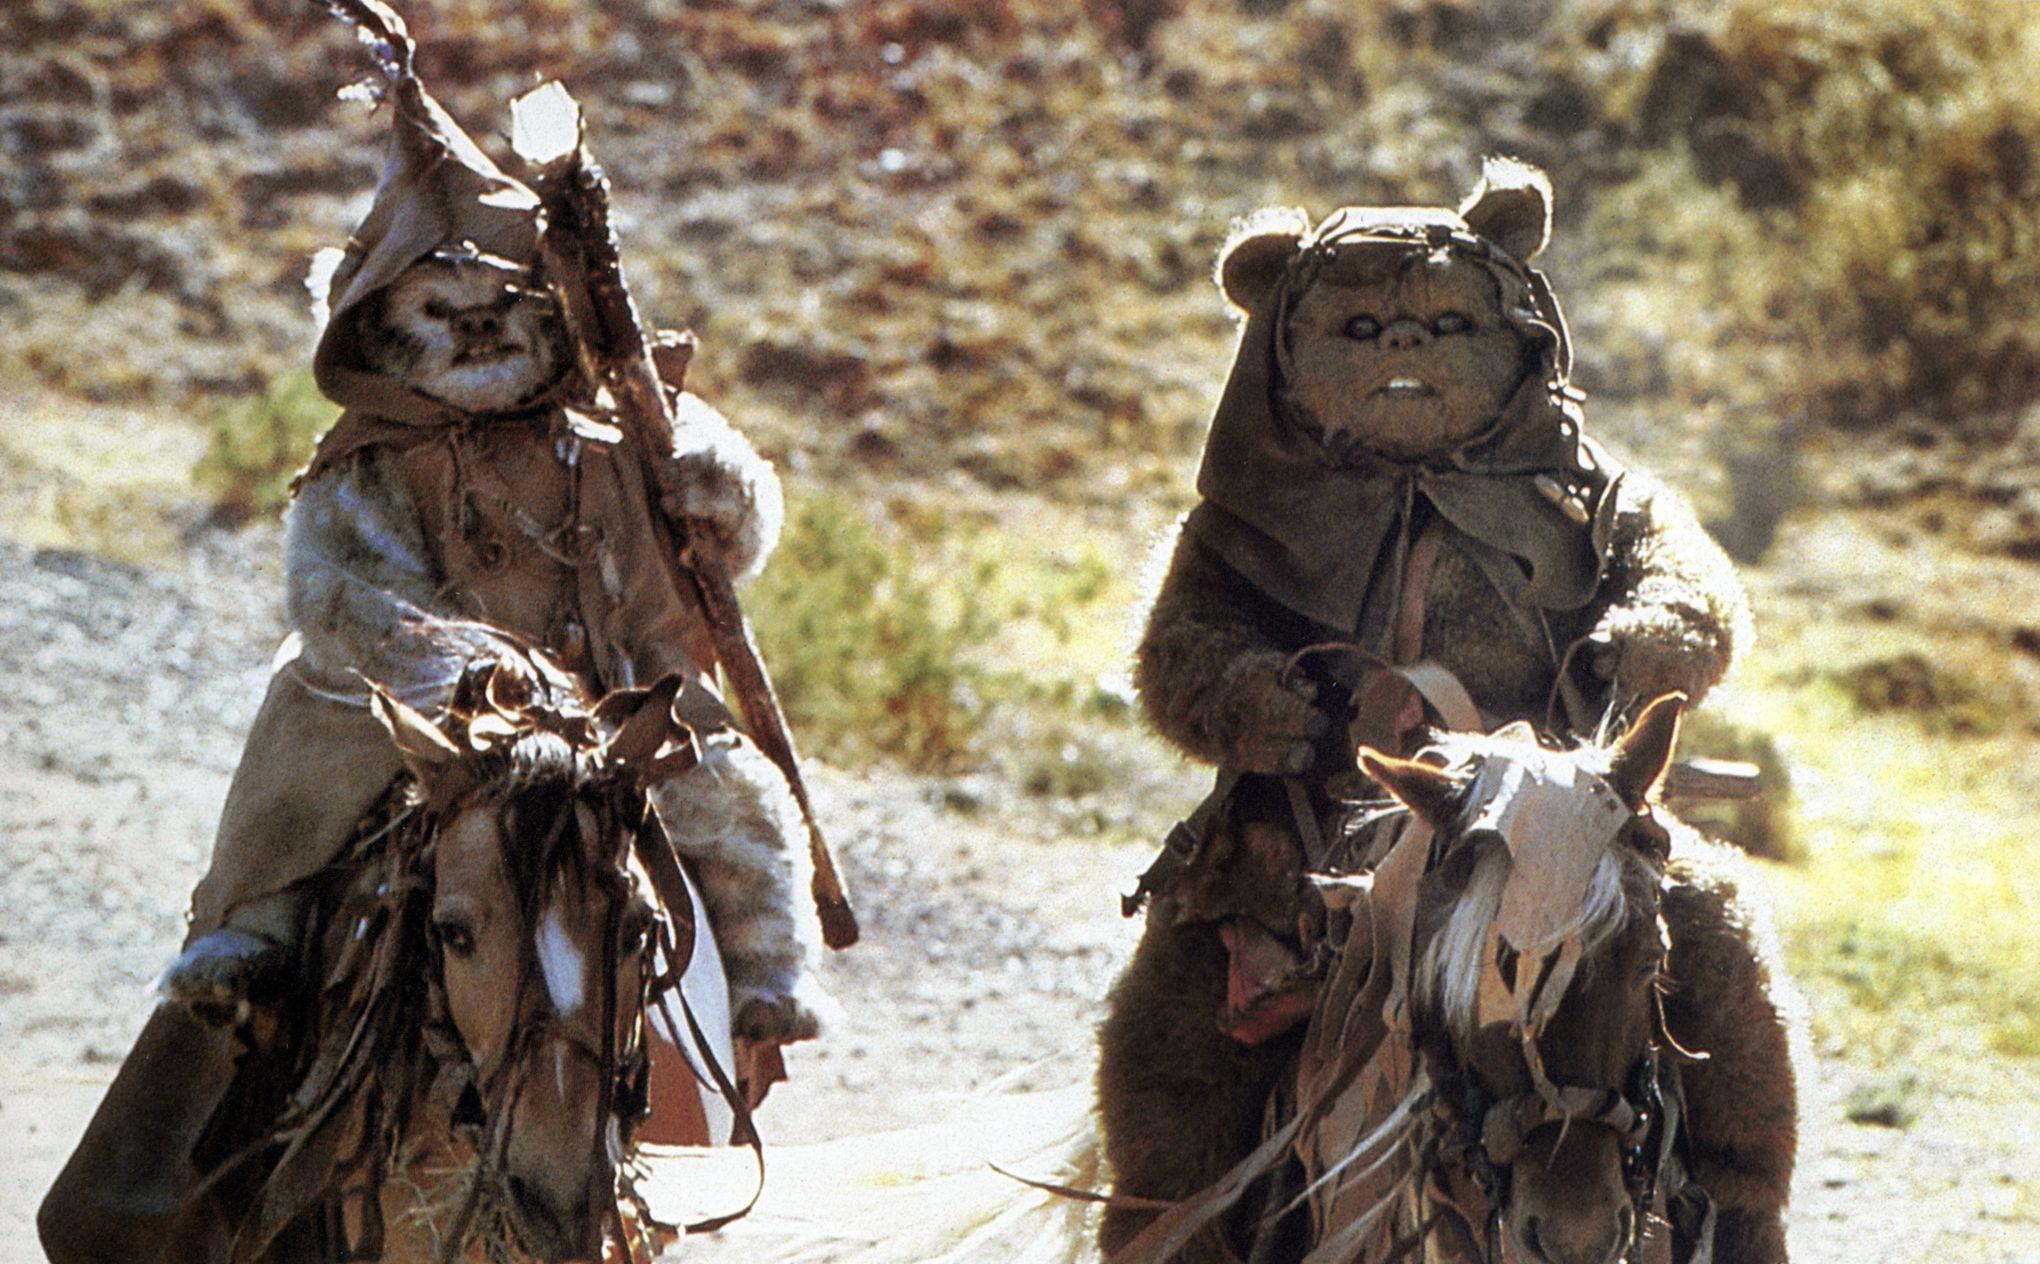 Star wars vii horreur malheur les ewoks veulent revenir - Personnage star wars 6 ...